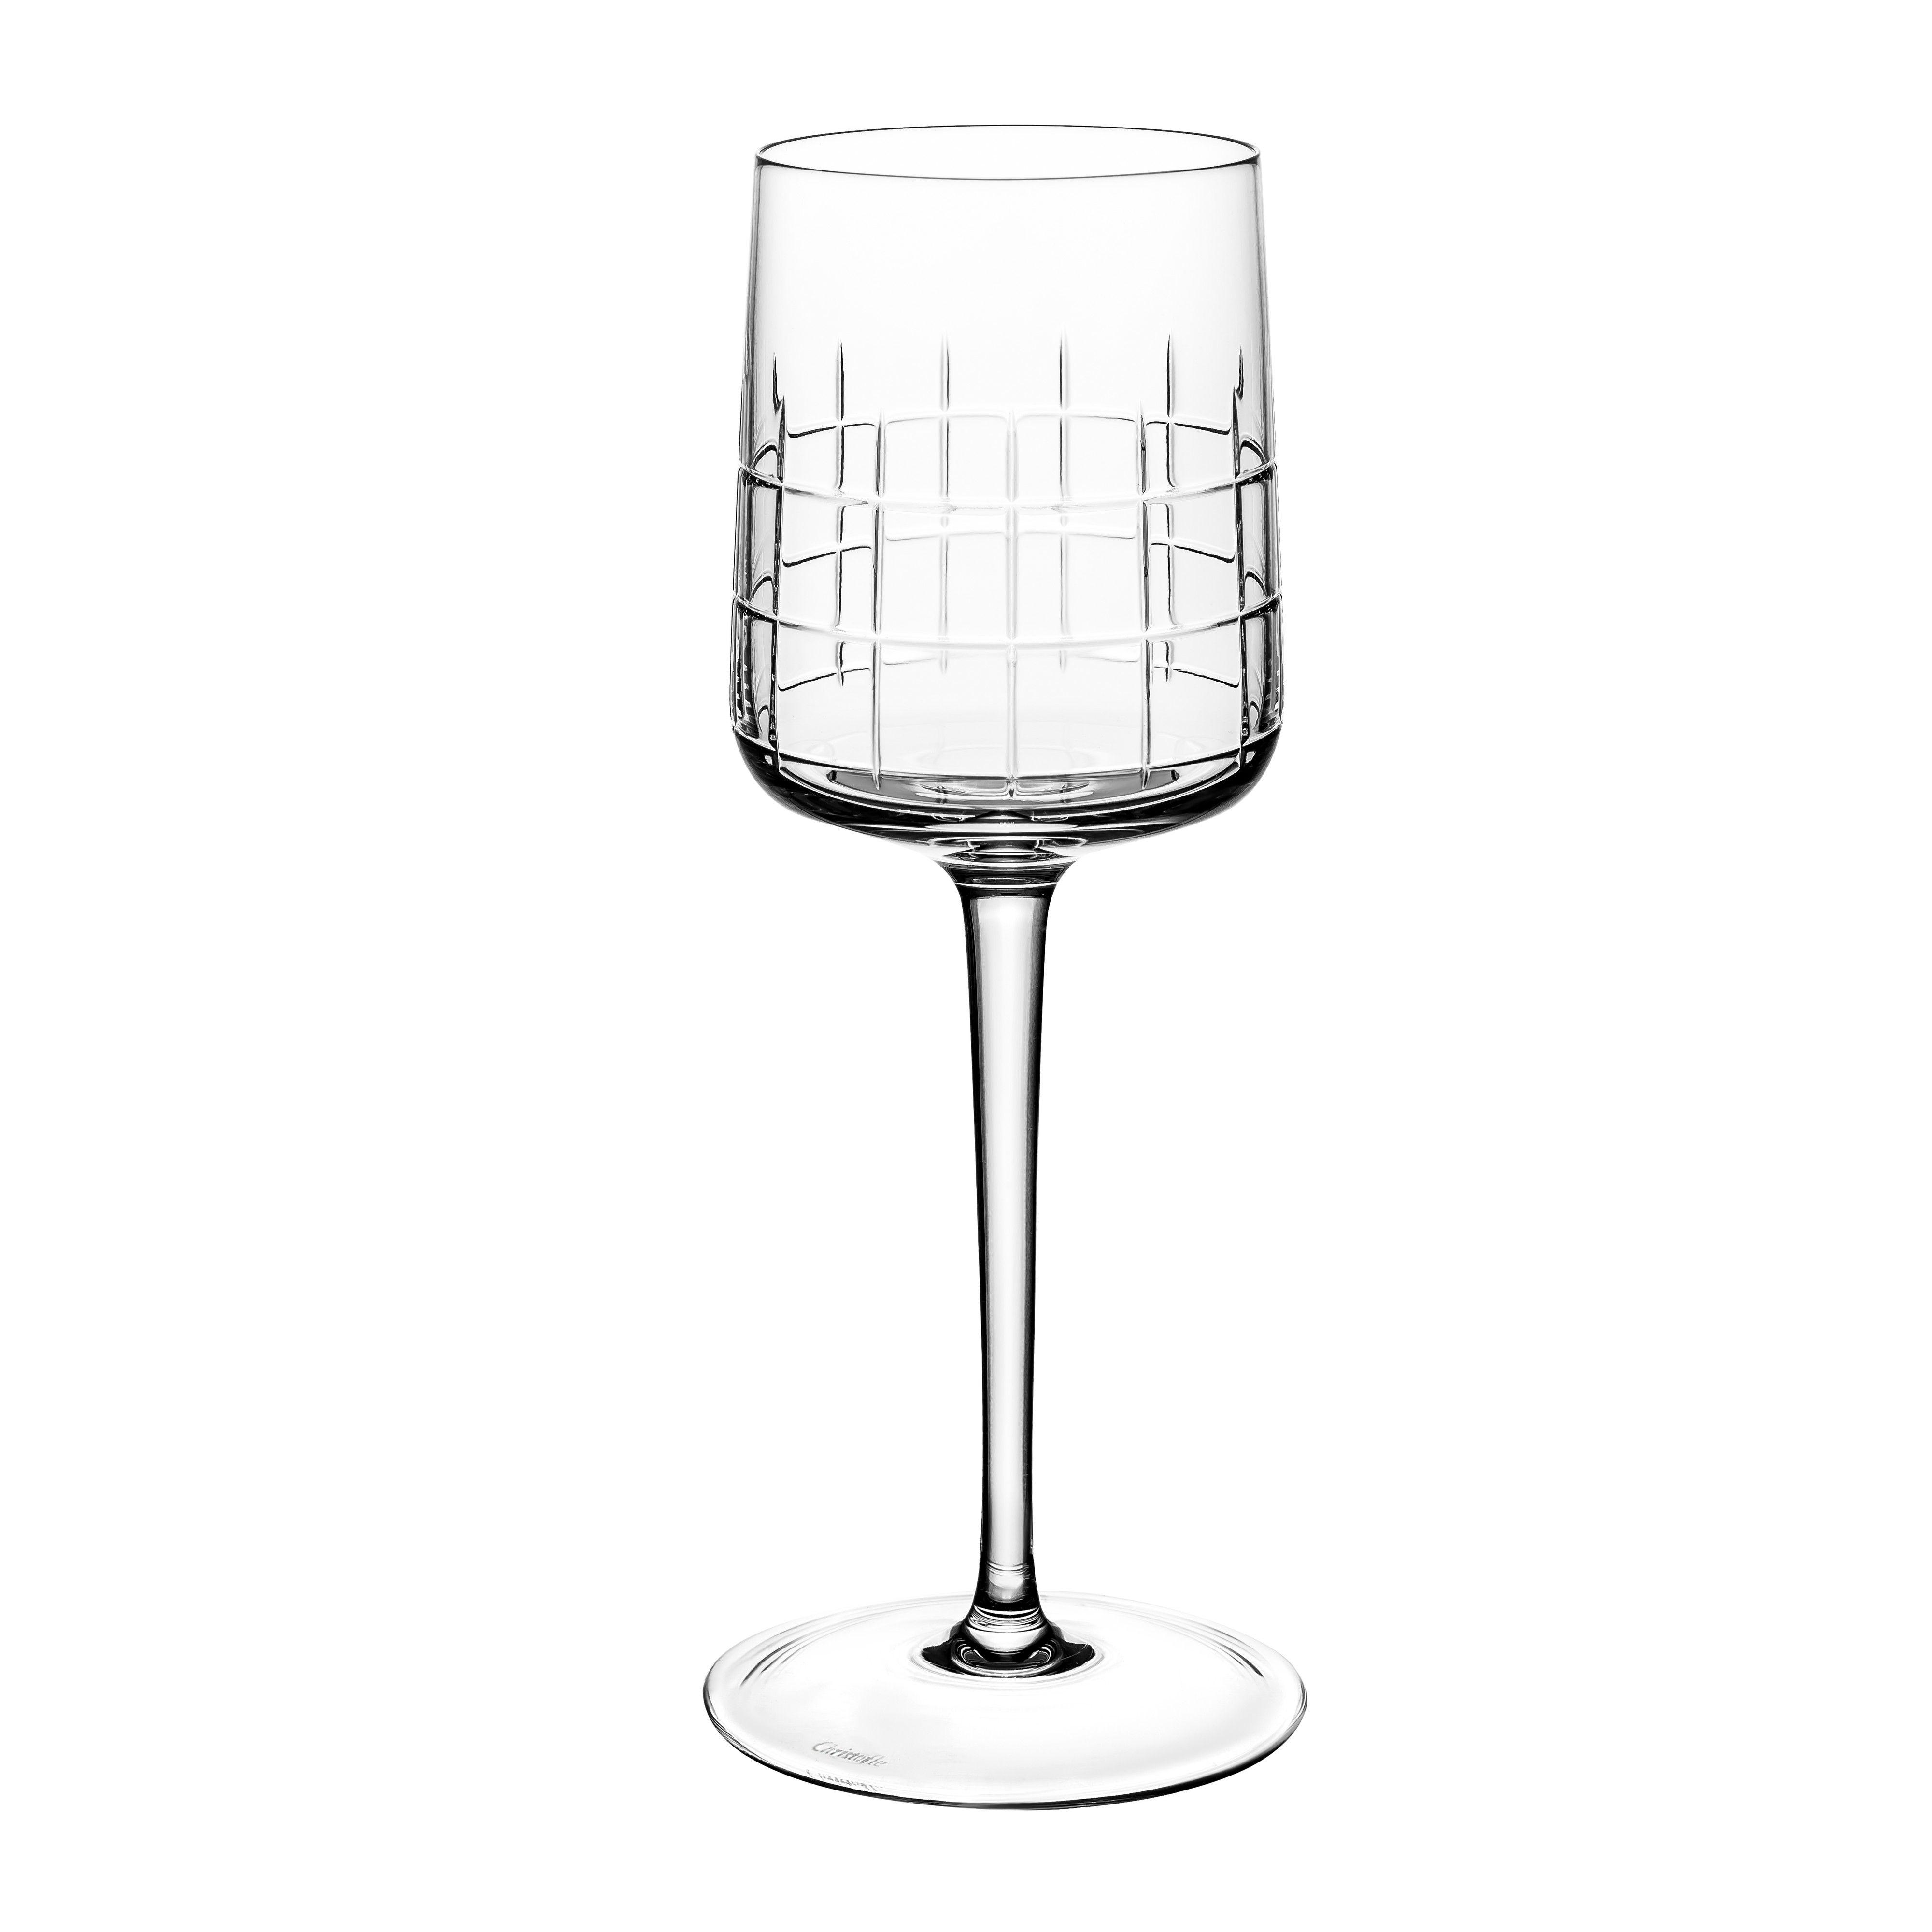 Christofle graphik crystal wine glass tableware agentia uk christofle graphik crystal wine glass tableware agentia uk jeuxipadfo Gallery